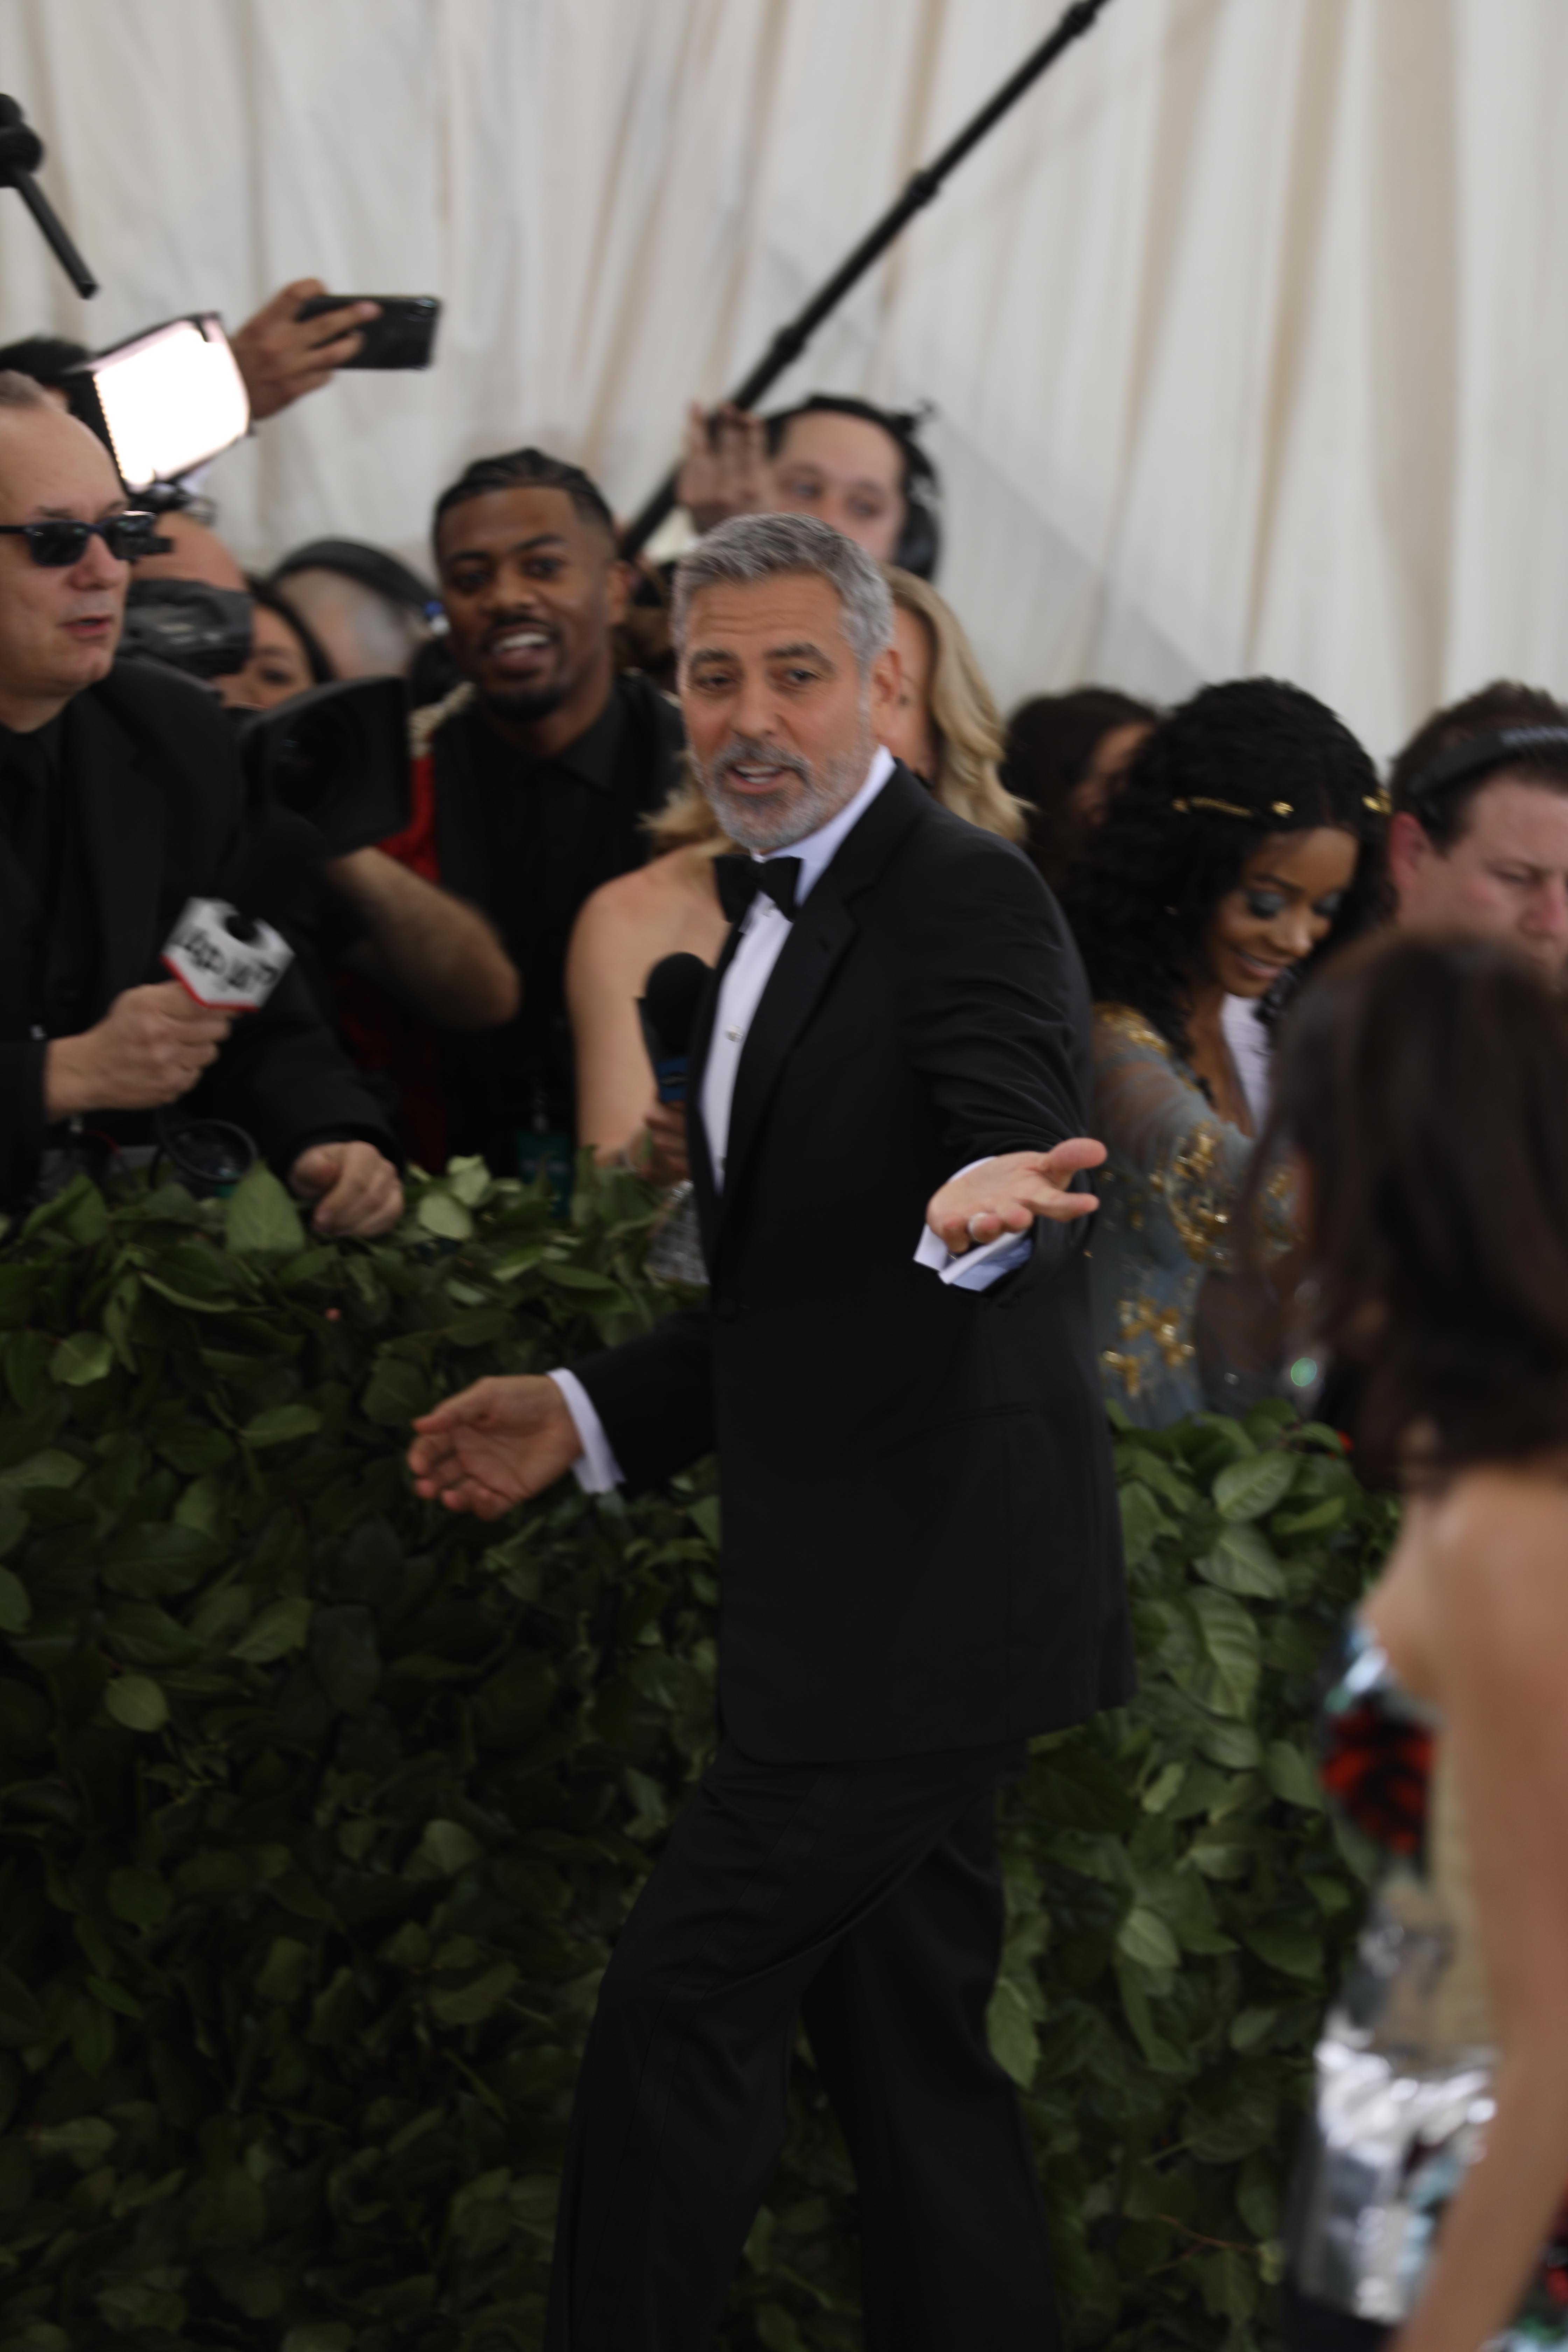 <div class='meta'><div class='origin-logo' data-origin='none'></div><span class='caption-text' data-credit='Emily Sowa (WABC)'>George Clooney</span></div>